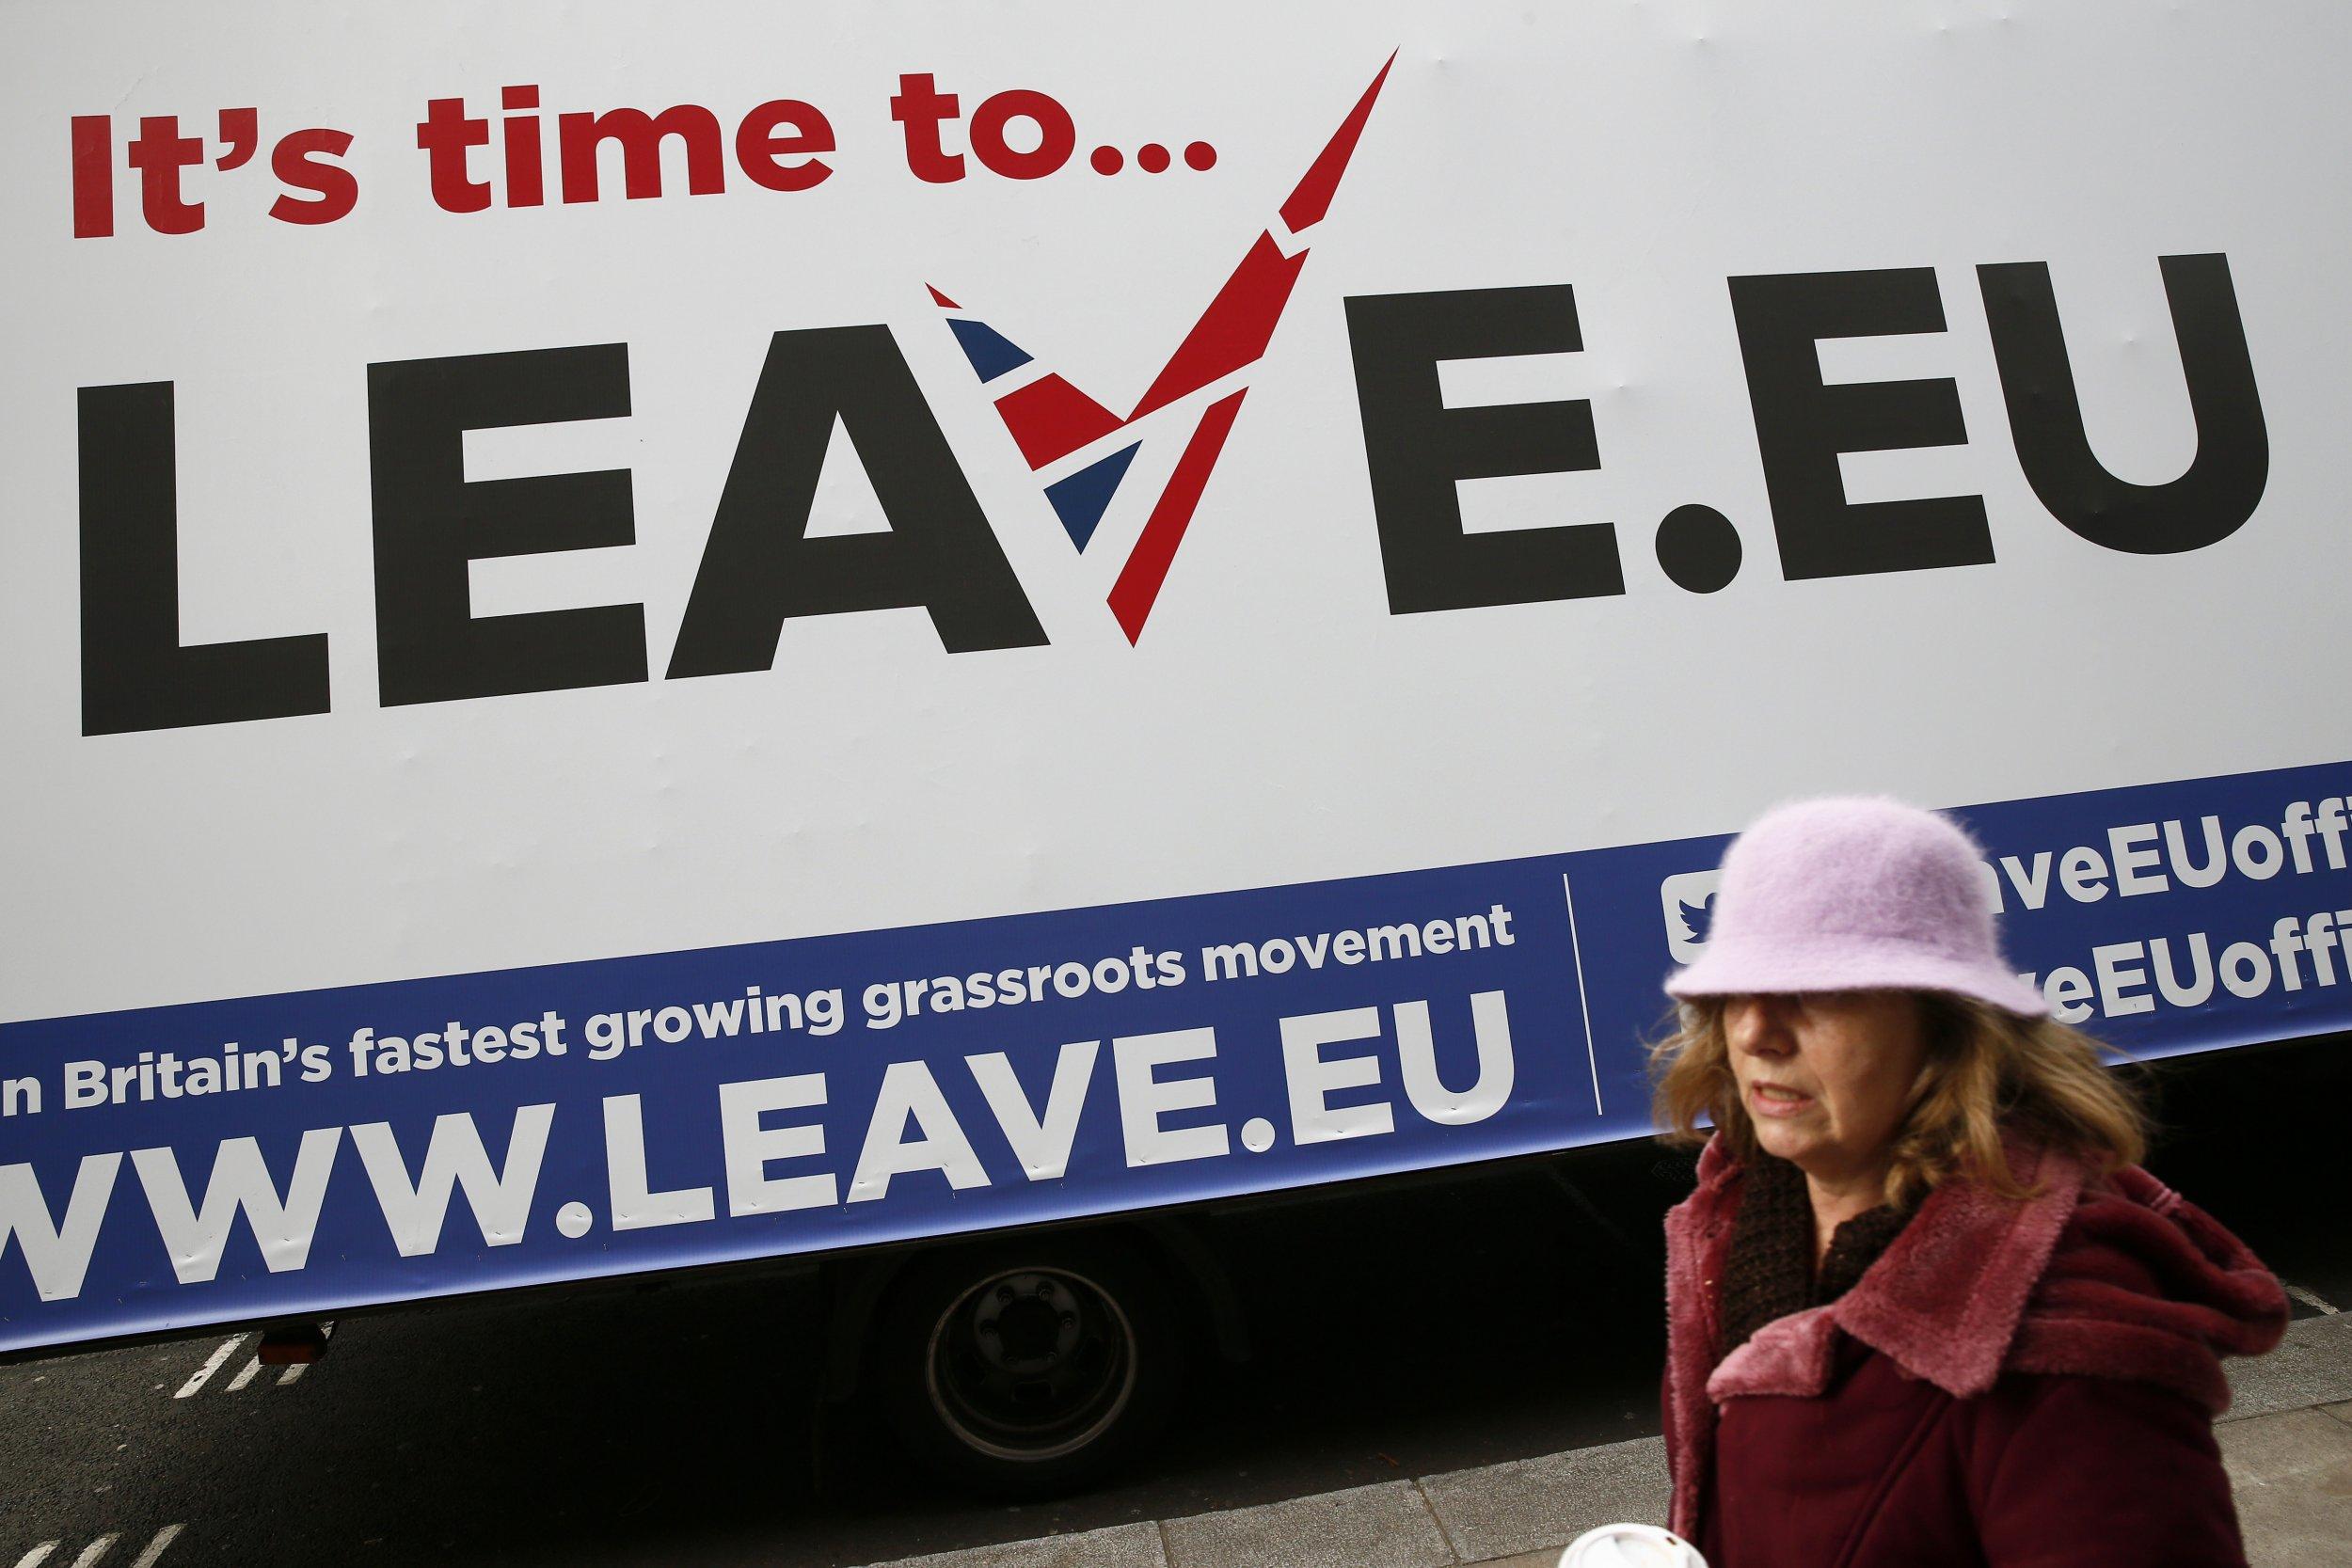 Leave.EU Poster